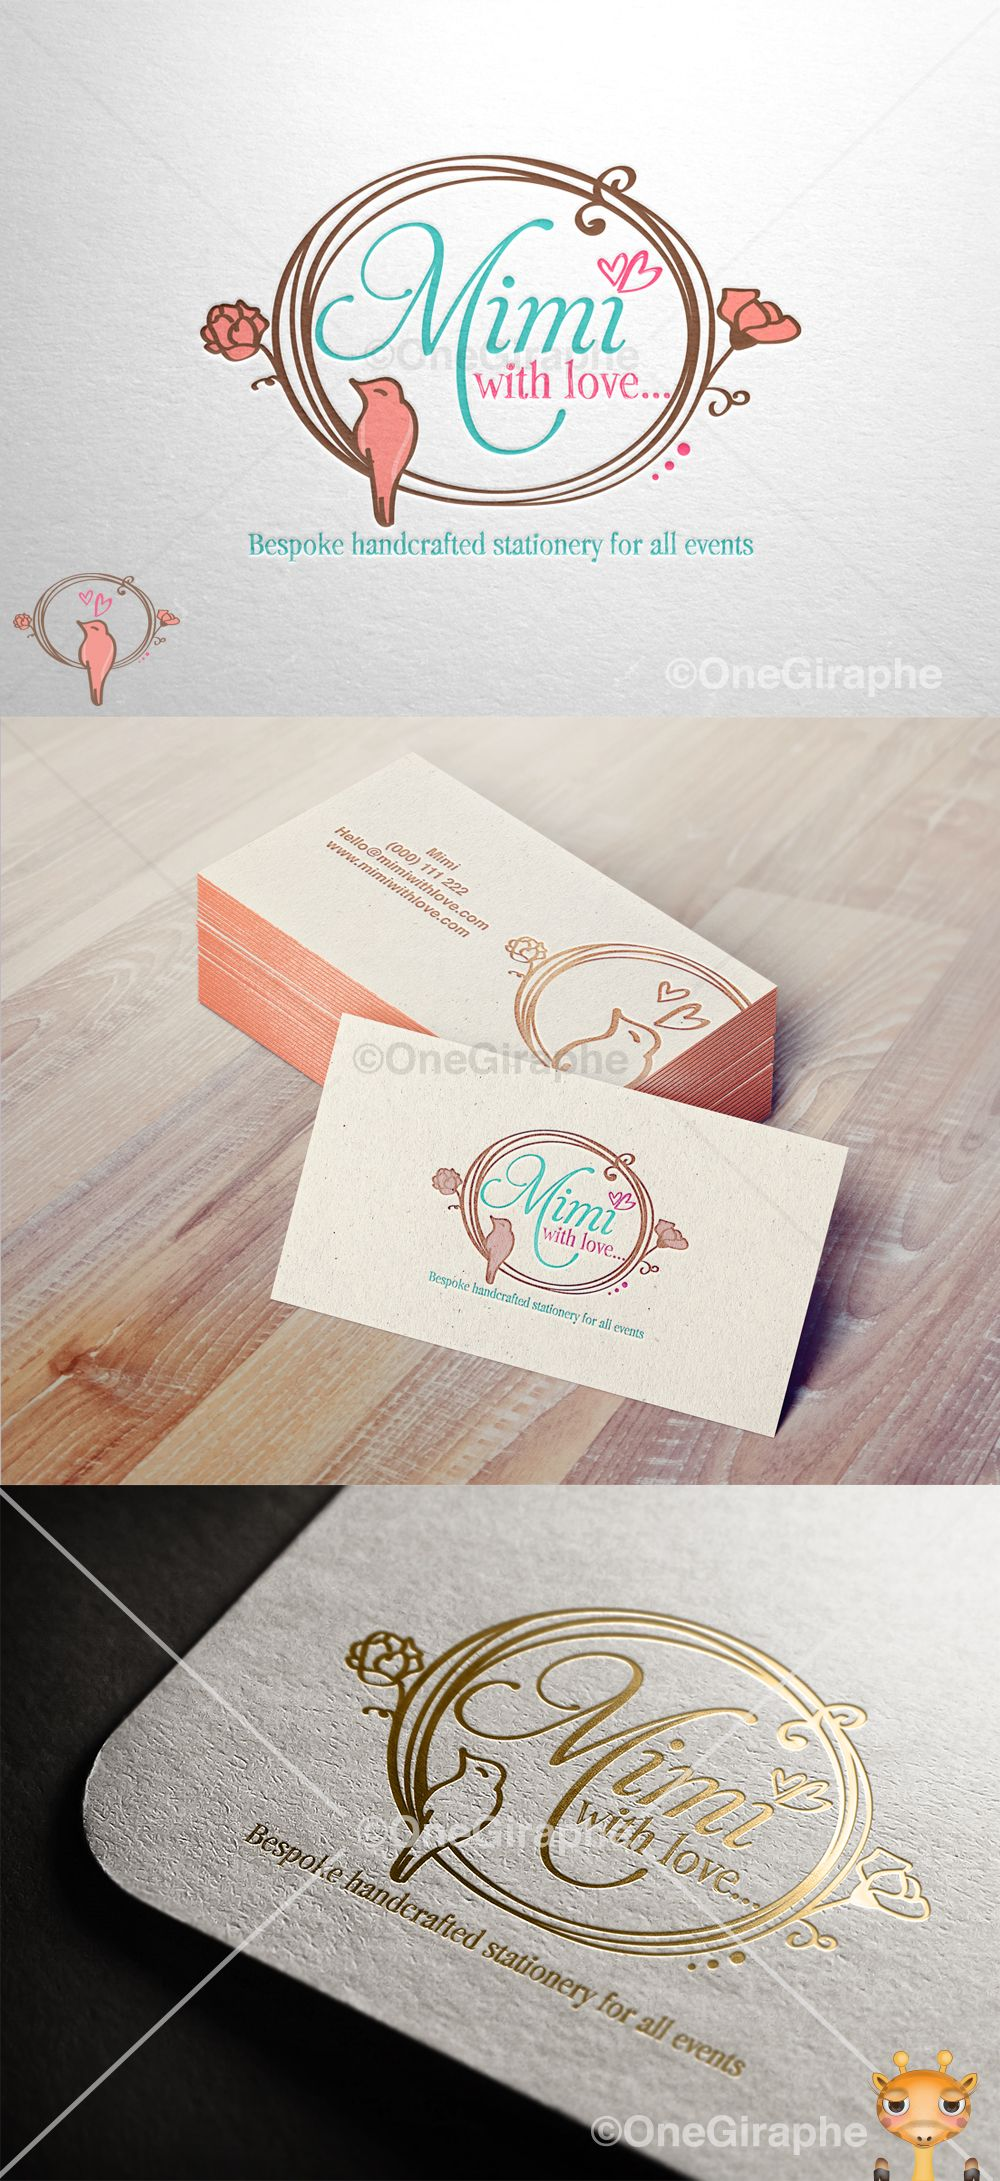 www.One-Giraphe.com #mom #bird #logo #logodesign #cute #graphic #design #designer #portfolio #behance #logopond #brandstack #sweet #logodesign #designer #brand #brandidentity #brandstack #logo #logodesign #graphicdesign #logopond #behance #craft #paper #letterpress #pattern  #badge #portfolio #flowers